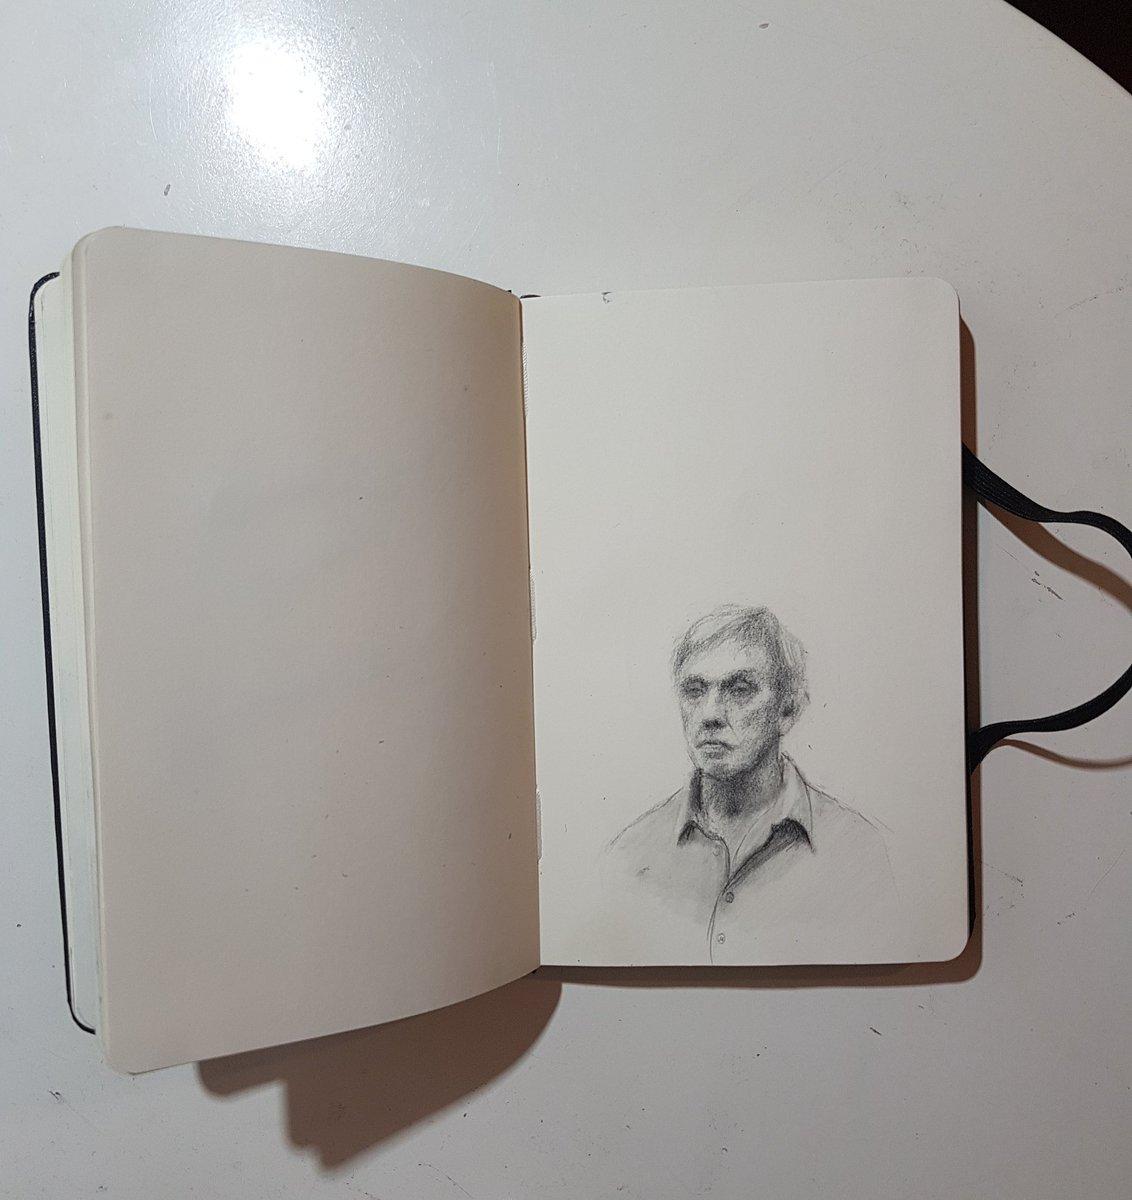 epub One Soldier\'s Story: A Memoir 2005